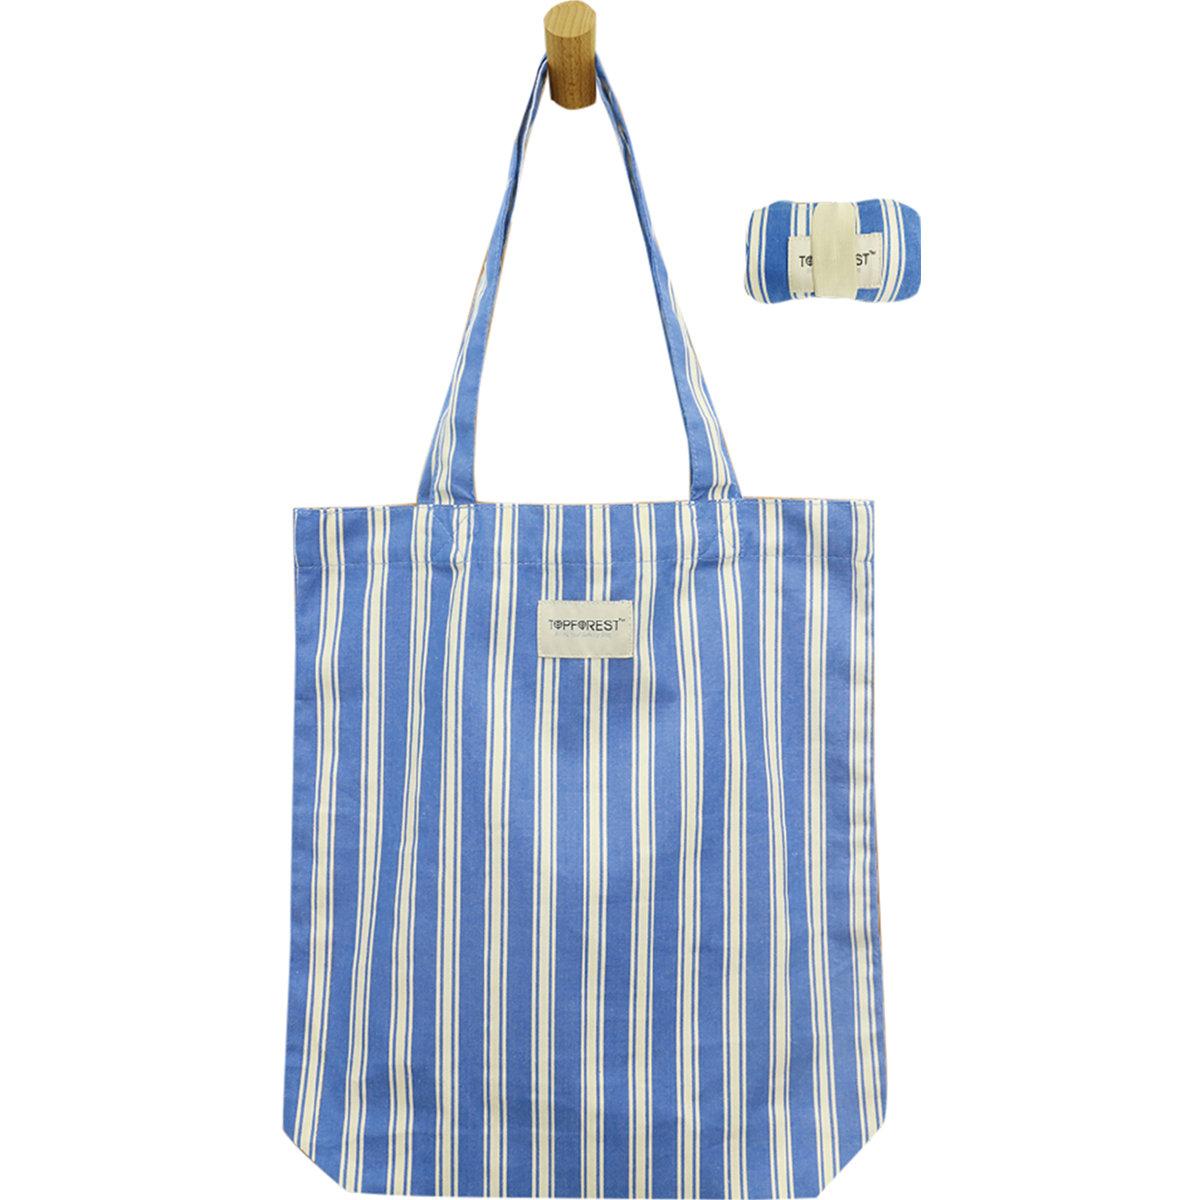 Stripe Cotton Foldable Shopping Bag Multipurpose A04017